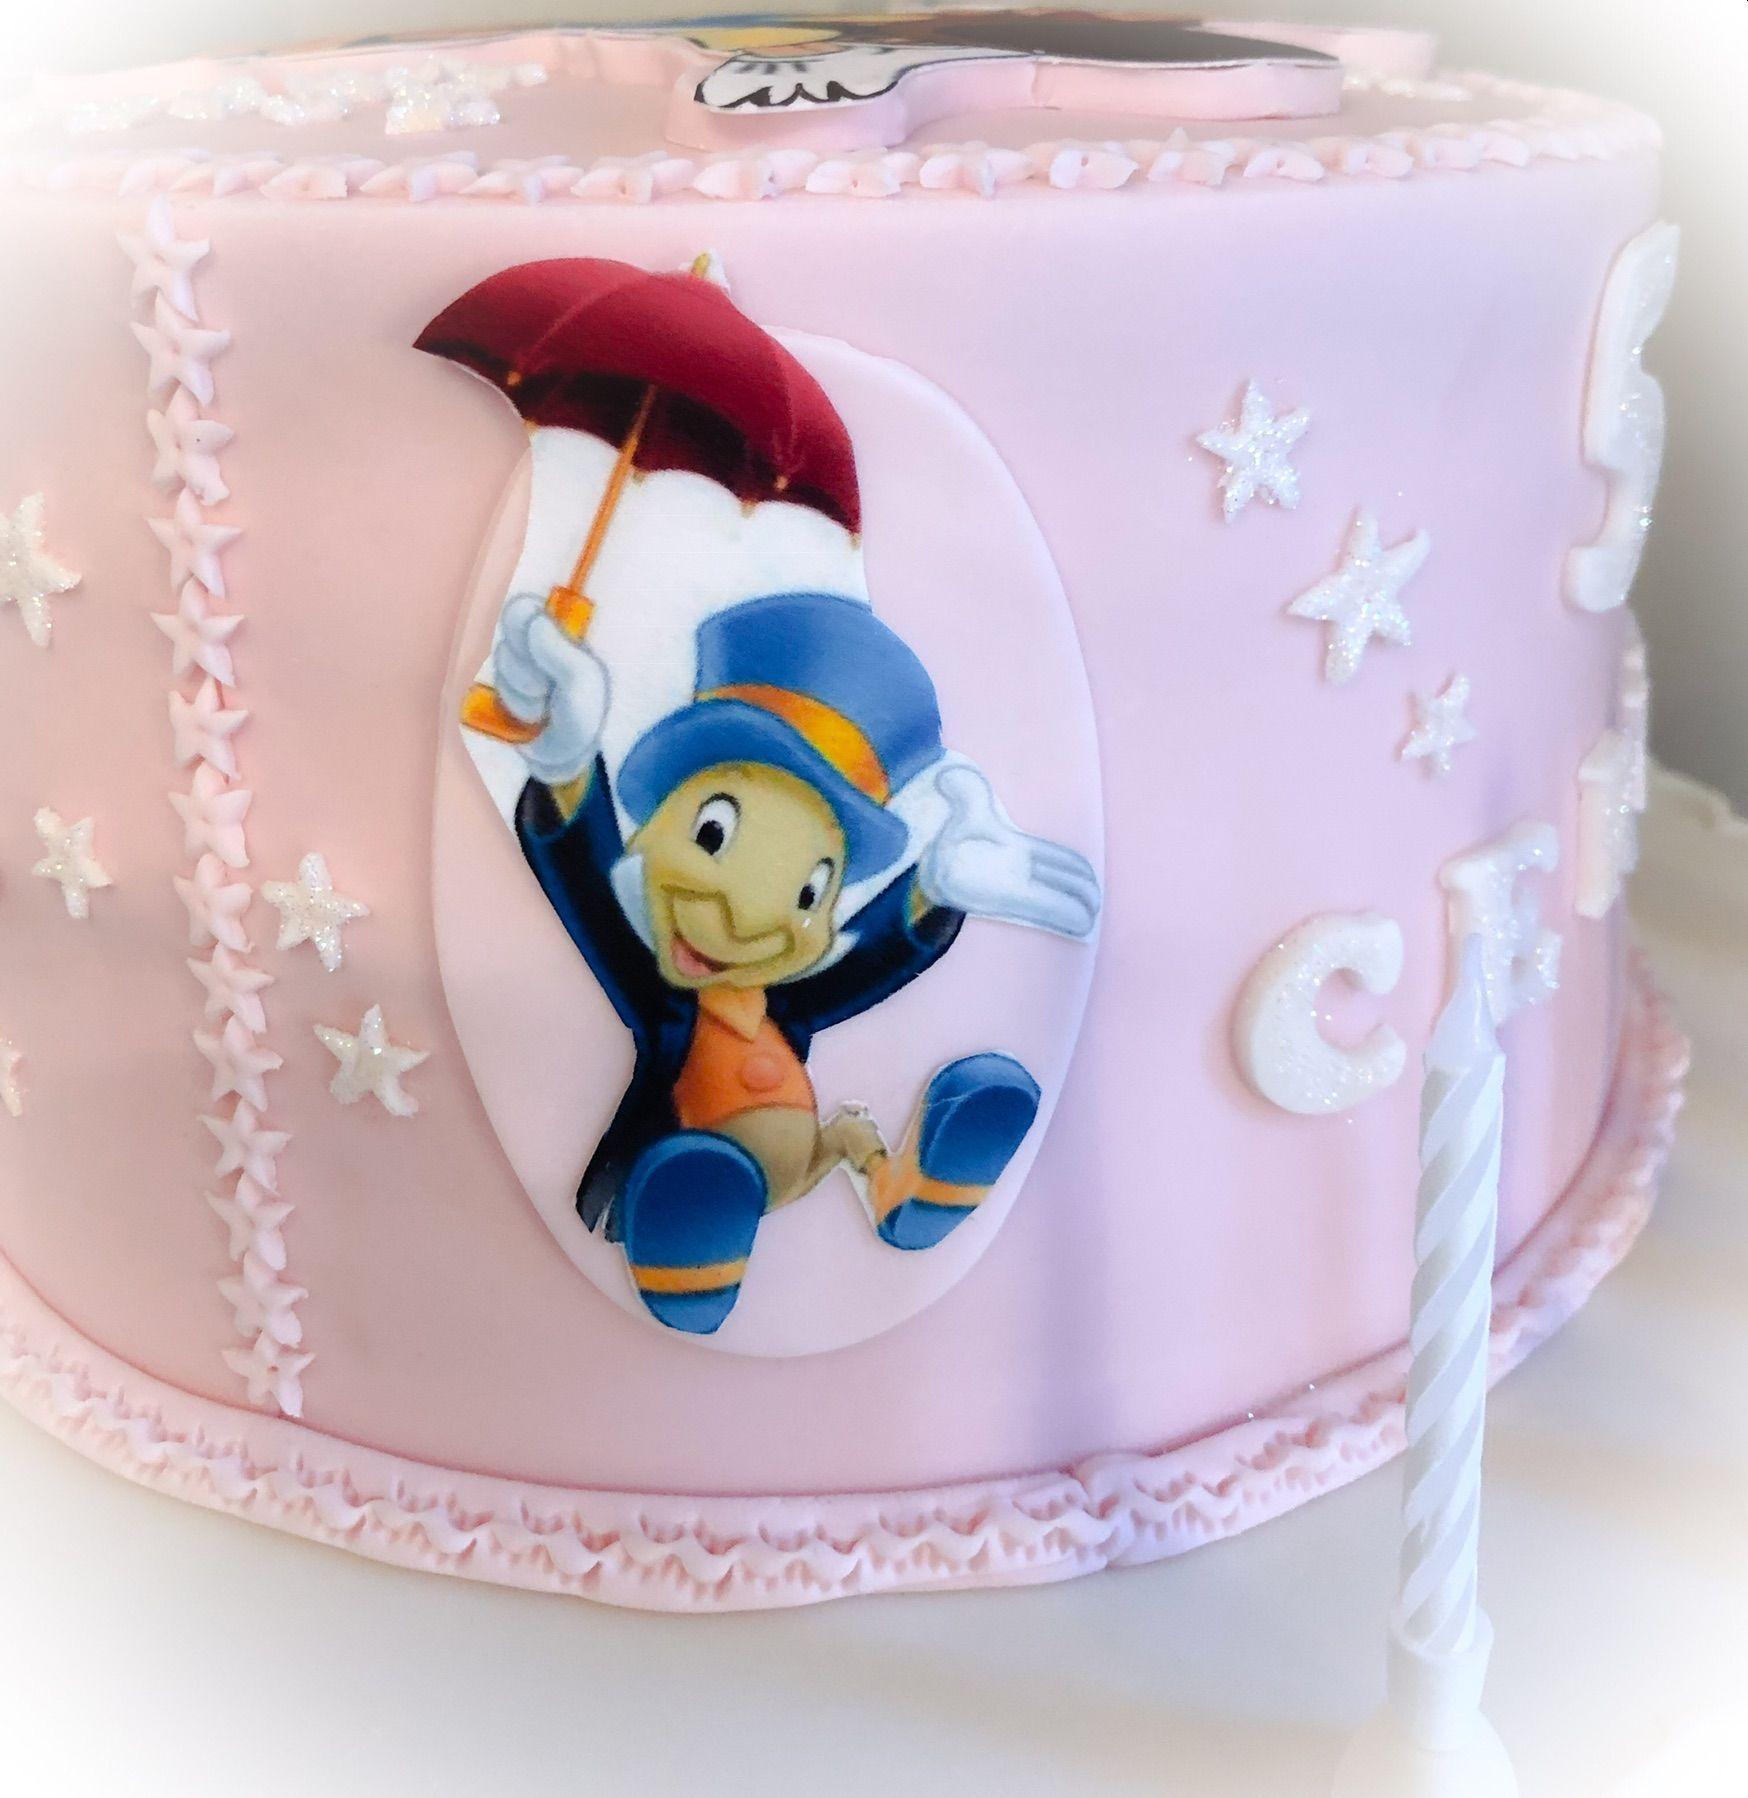 pinocchio cake 2